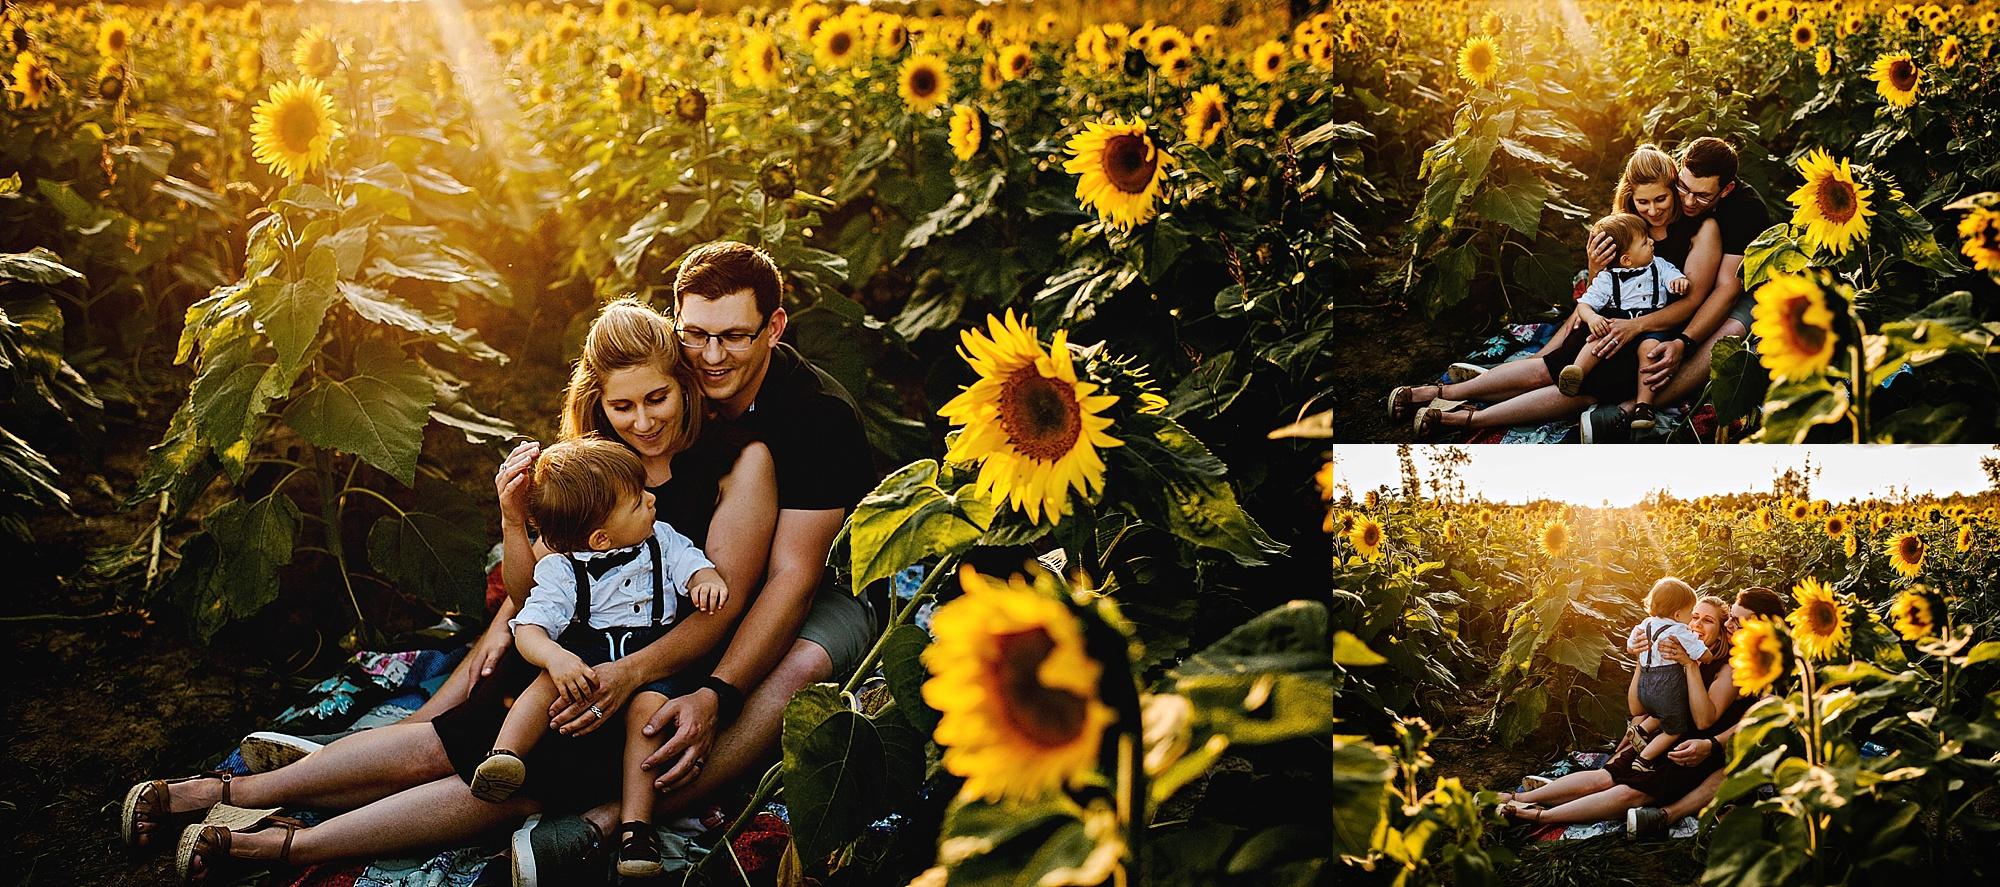 Schreiner-family-lauren-grayson-cleveland-photographer-sunflower-field-session_0014.jpg